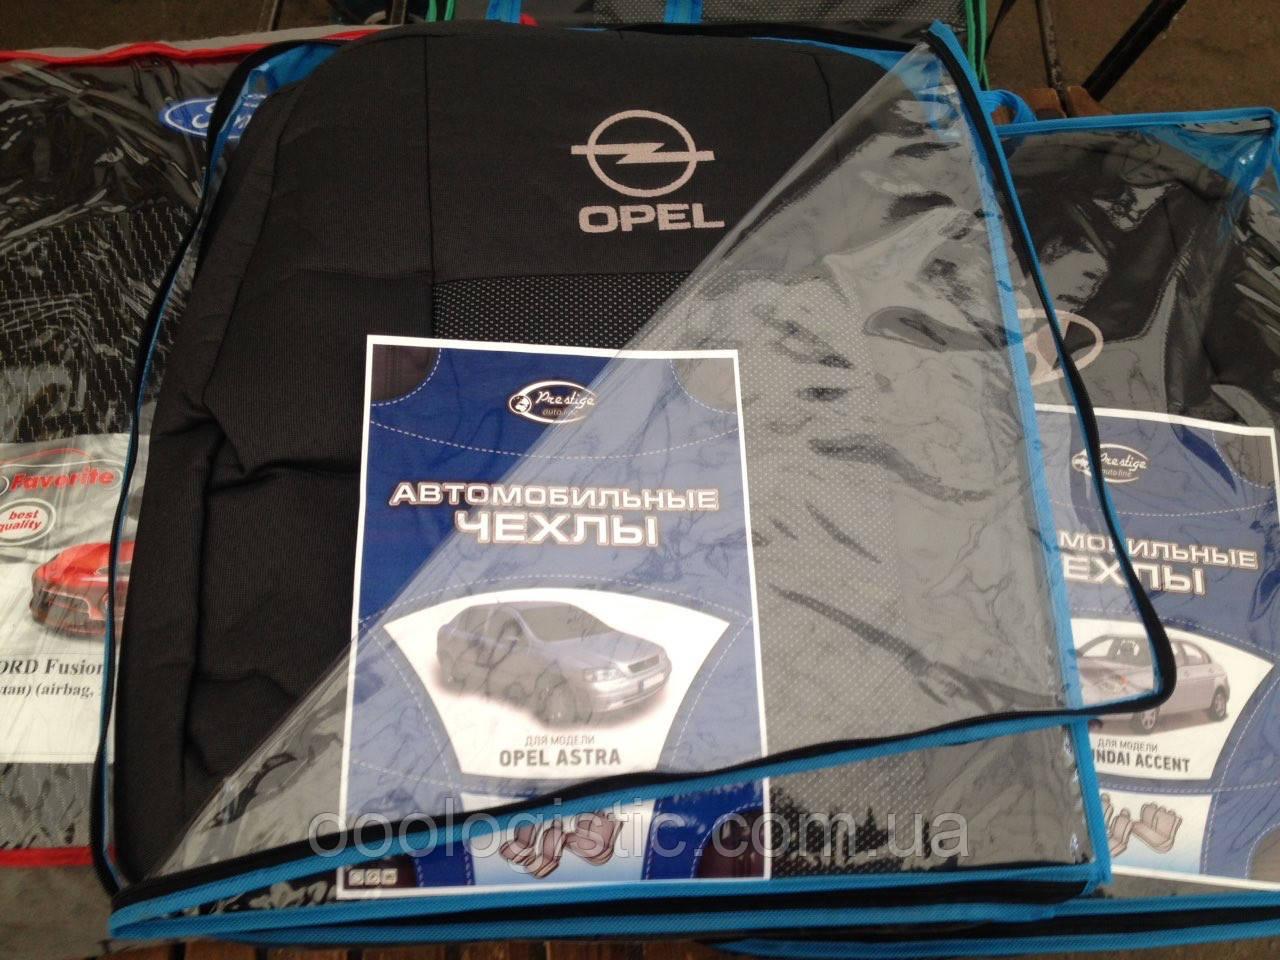 Авточехлы  на Opel Astra,авточехлы  на Опель Астра